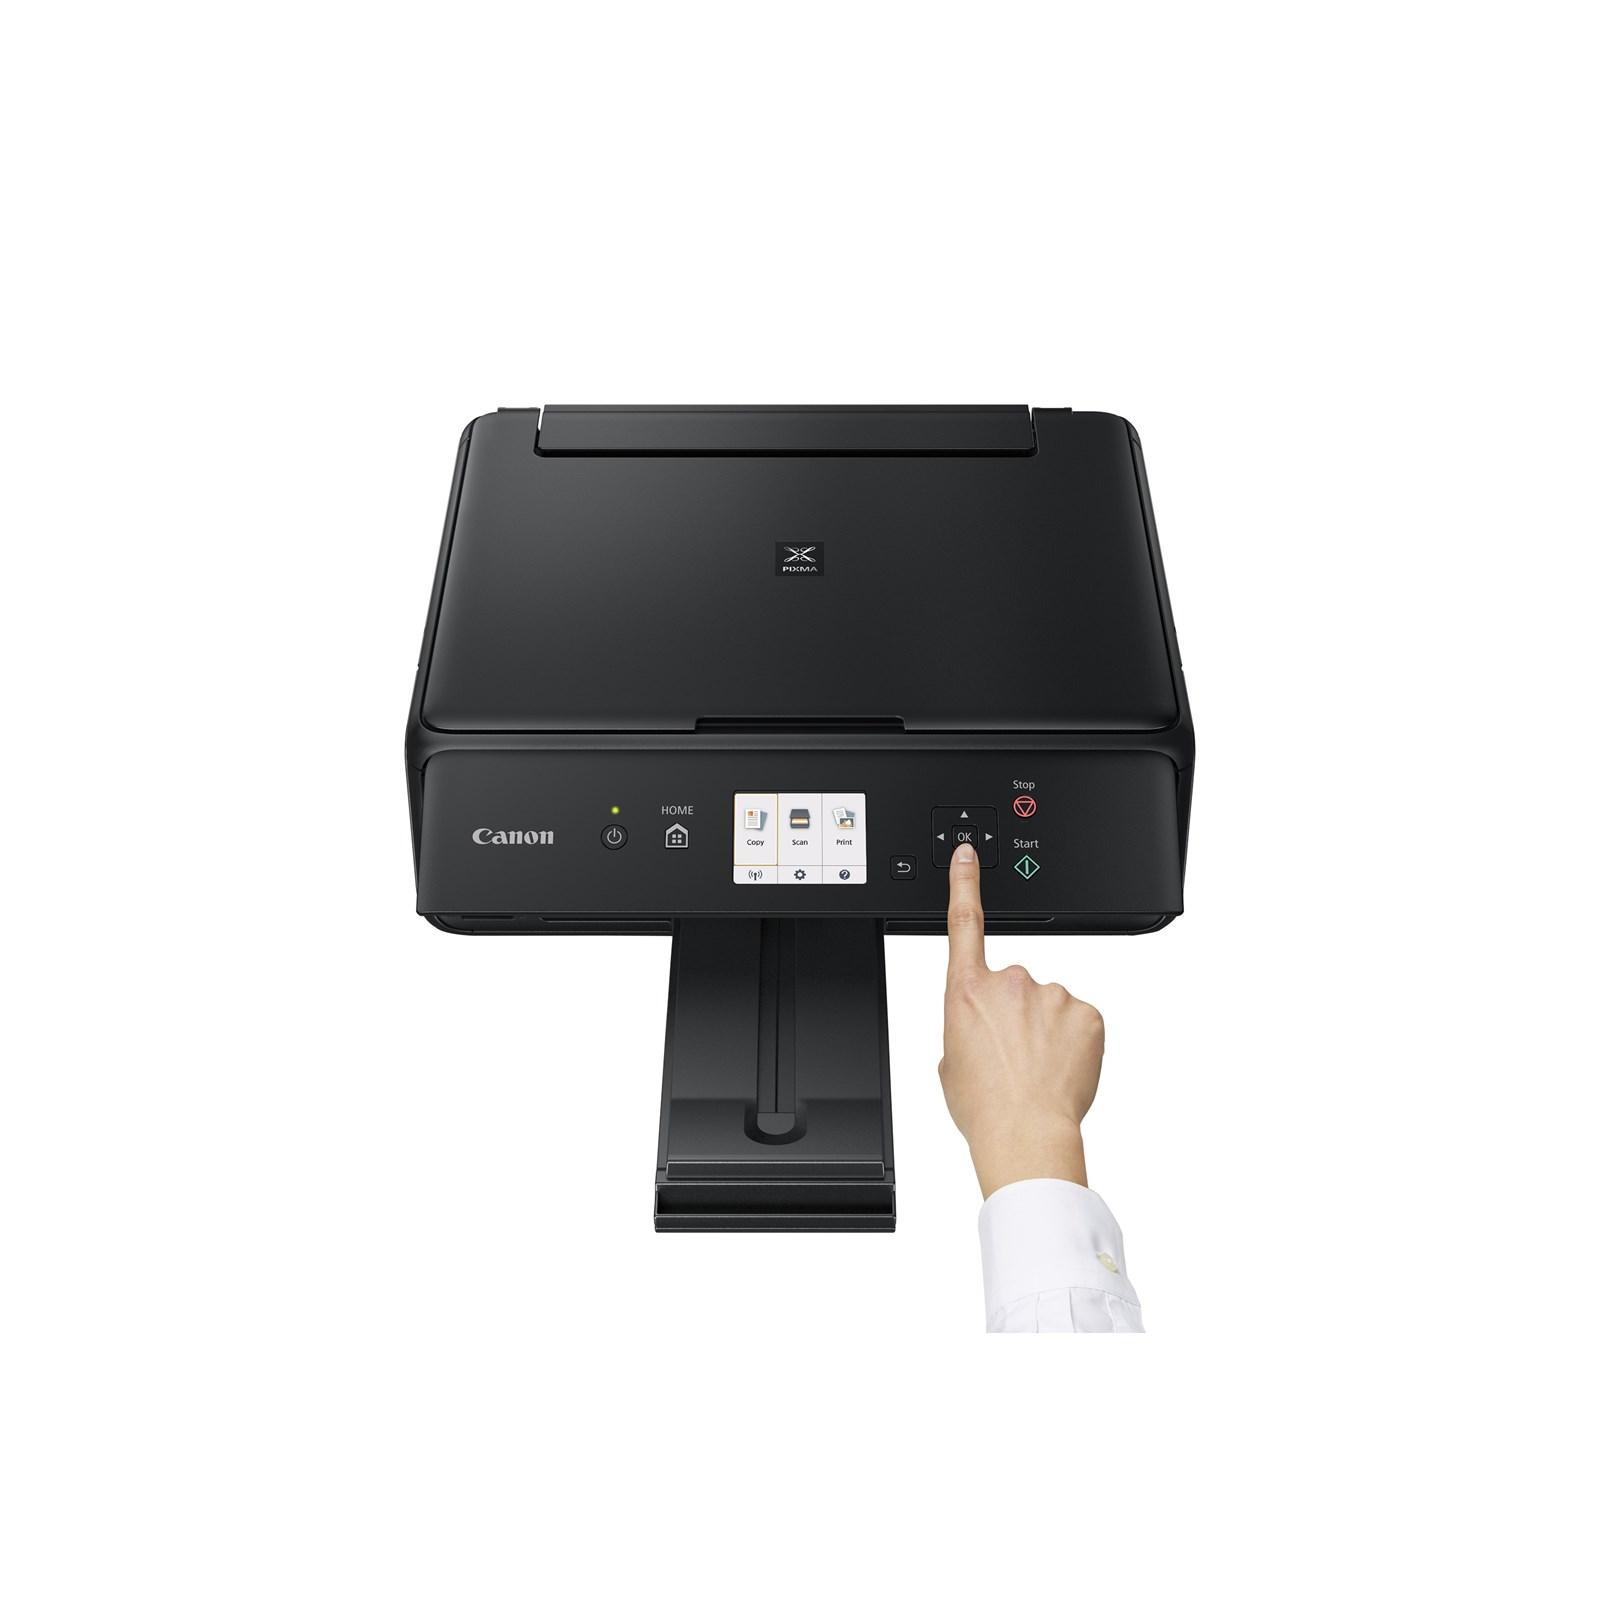 Canon Pixma Ts5050 A4 Colour Inkjet Multifunction Printer Print Hp Officejet 7110 Web Wifi Copy Scan